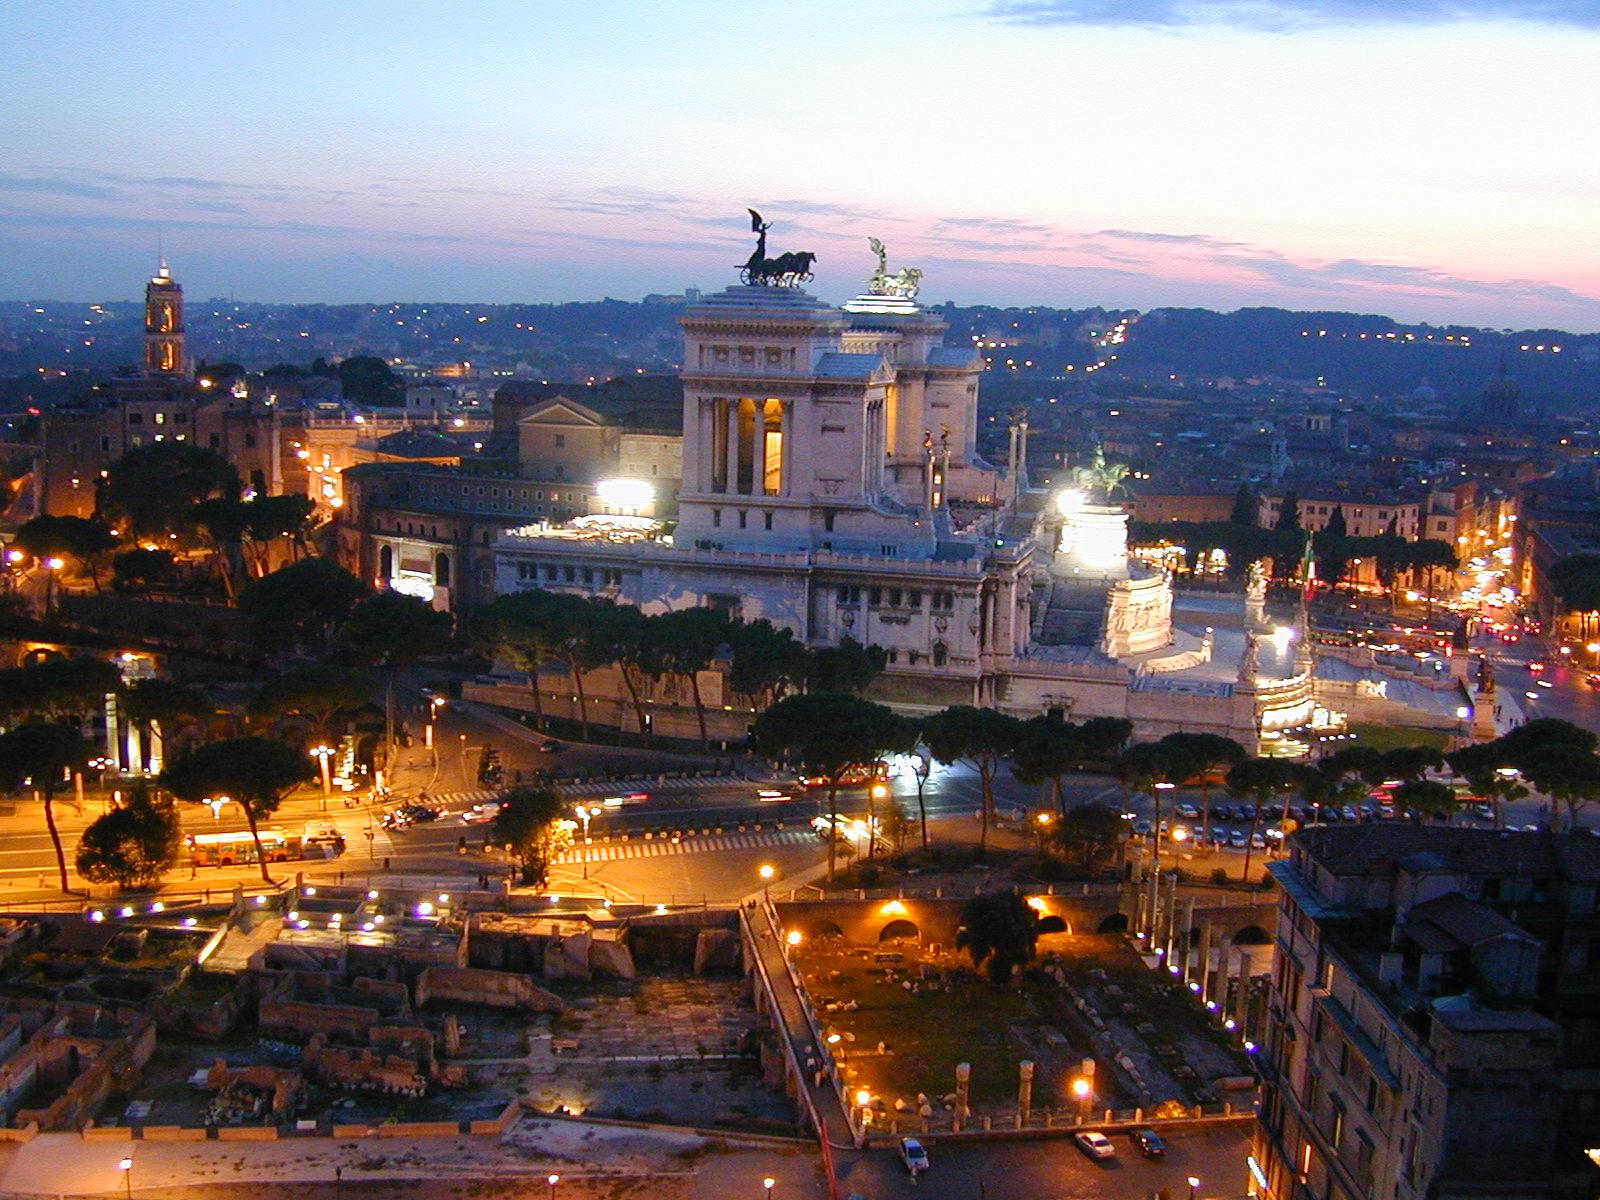 raffaelevalobra city view evening dusk lights rome forum Altare della Patria